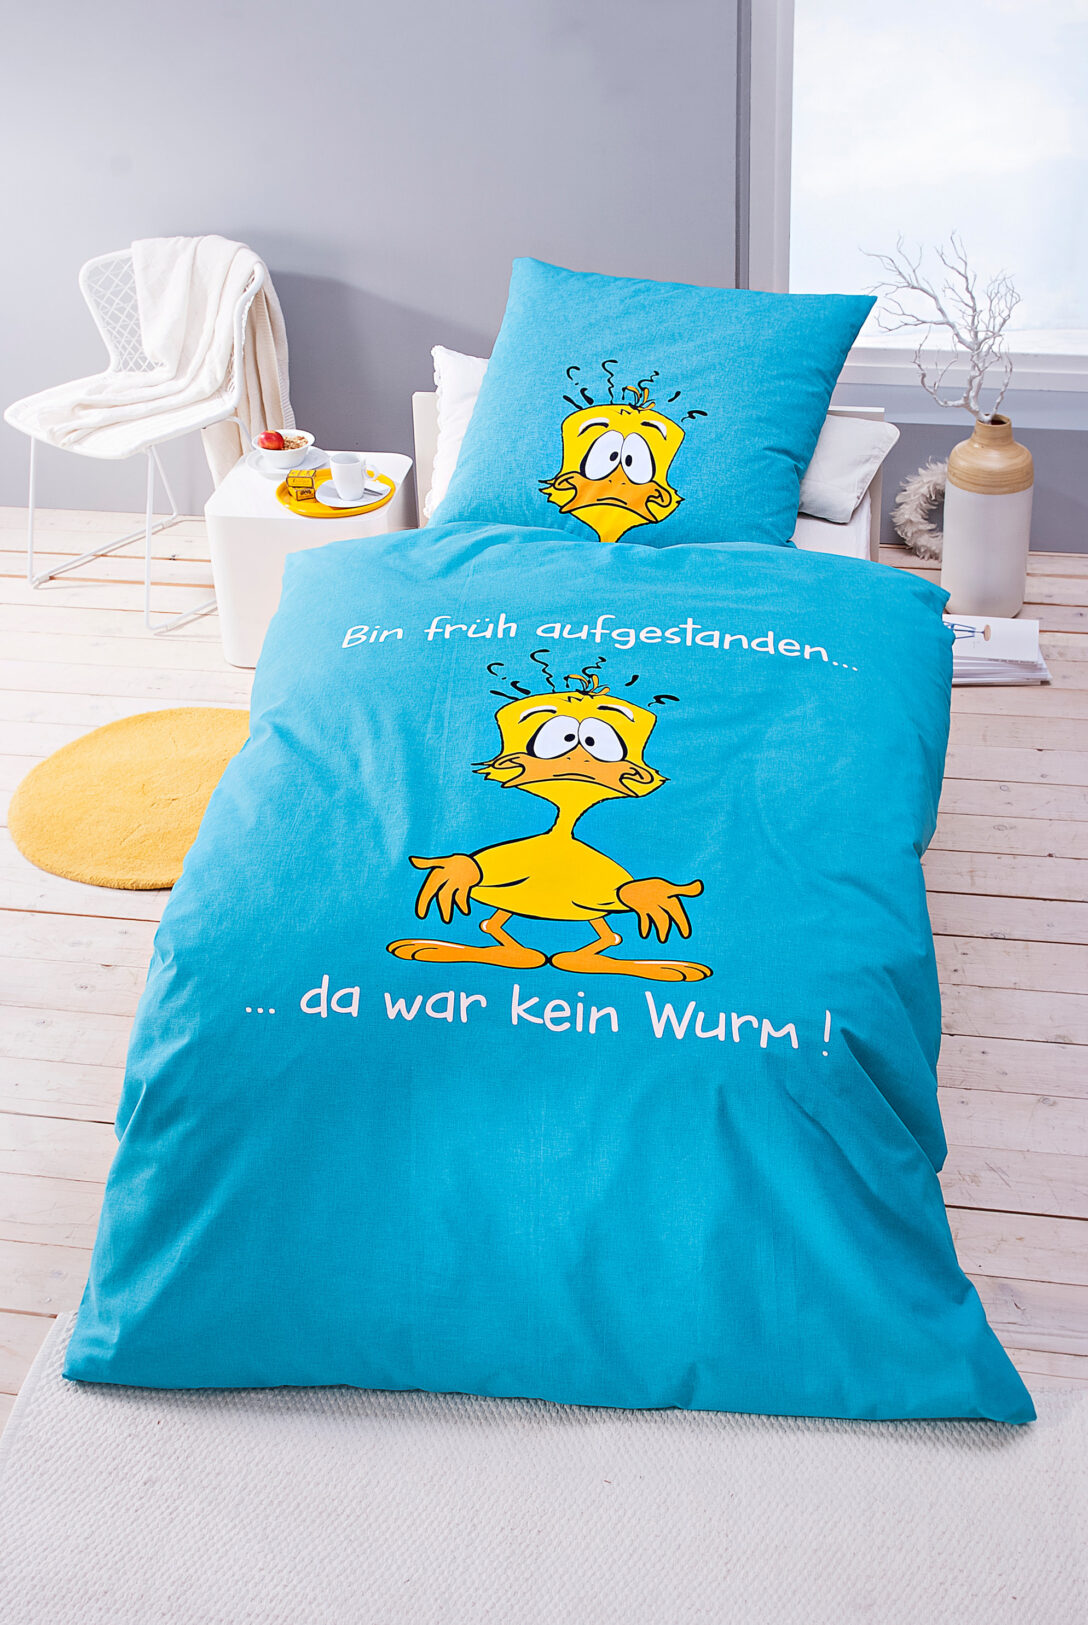 Large Size of T Shirt Lustige Sprüche Bettwäsche T Shirt Wohnzimmer Bettwäsche Lustig